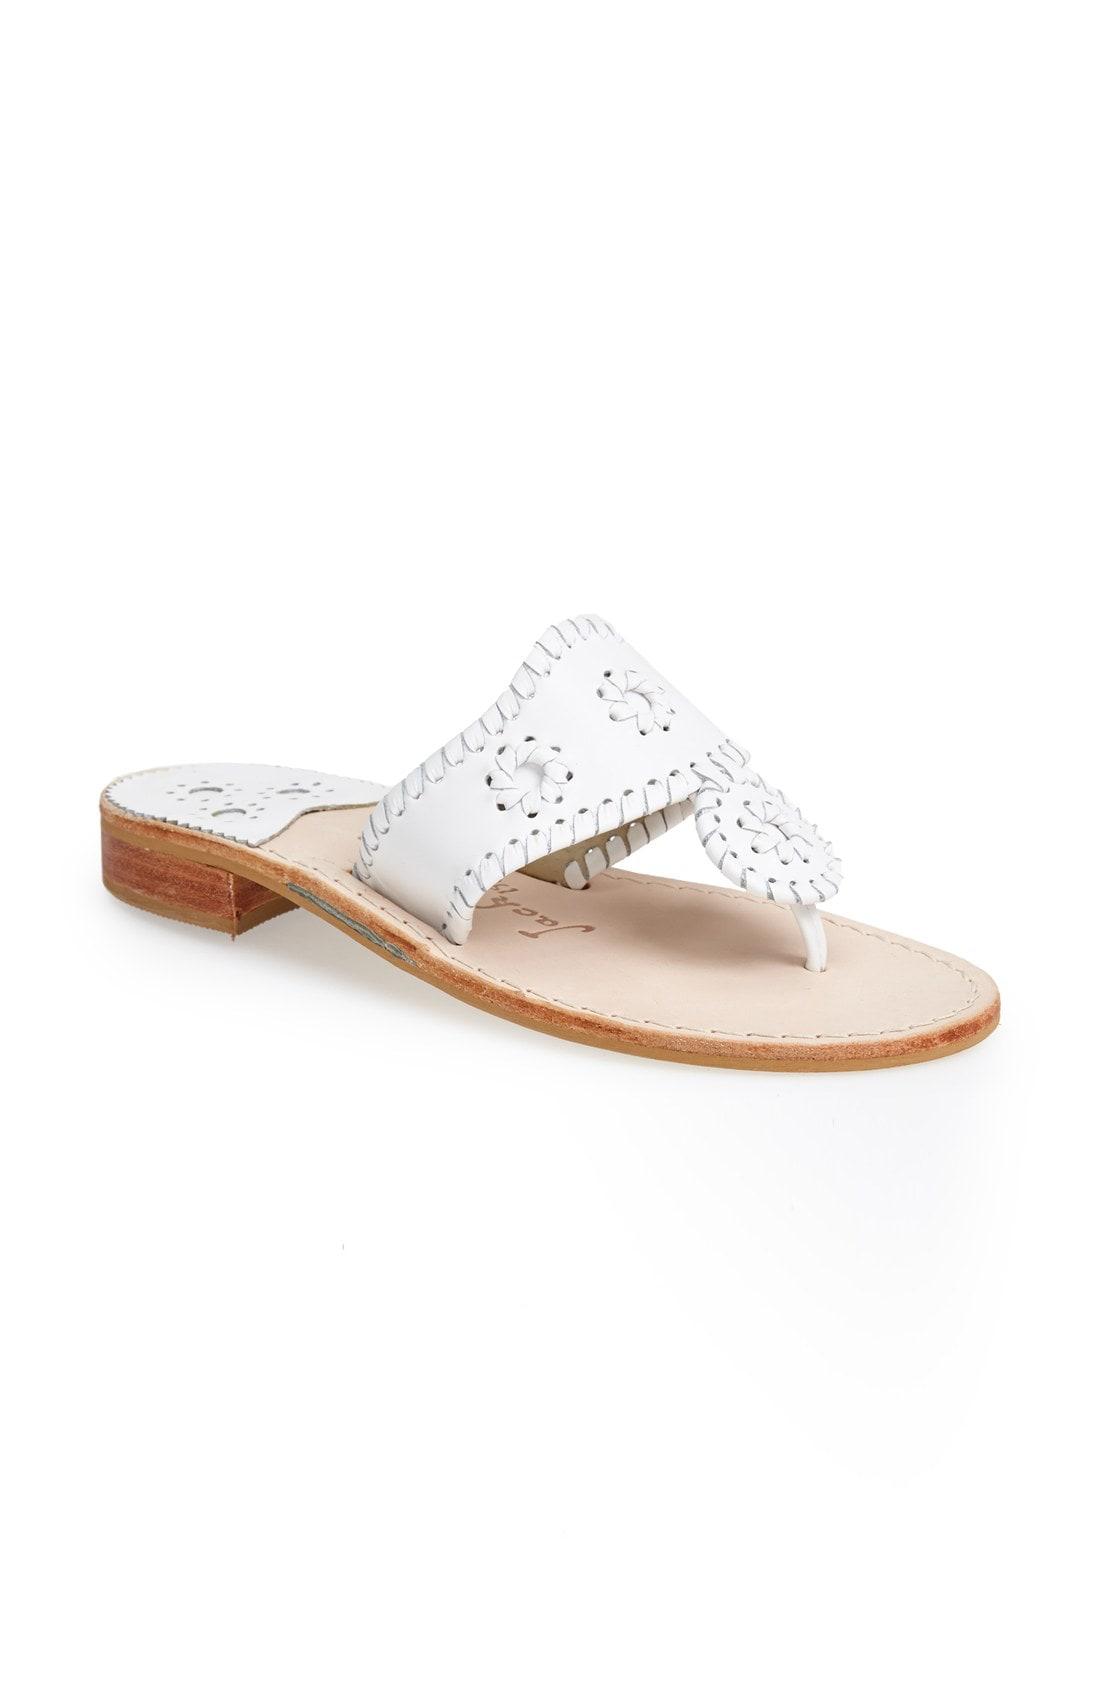 88d5d09dd54d Jack Rogers Jacks Flat Thong Sandals In White